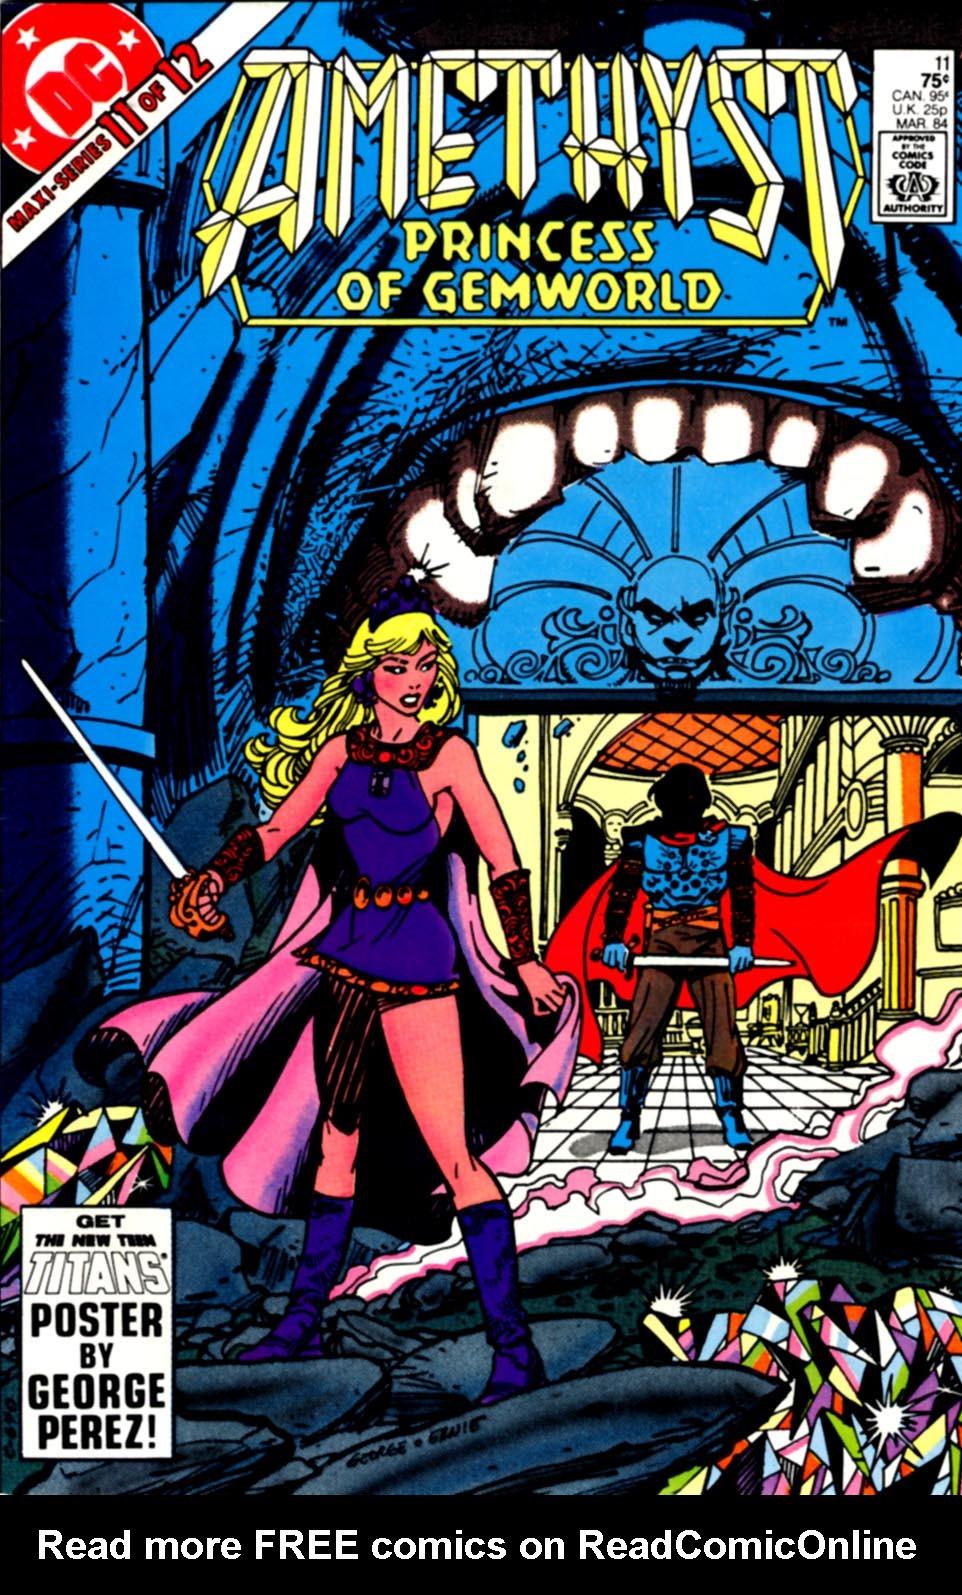 Amethyst, Princess of Gemworld 11 Page 1